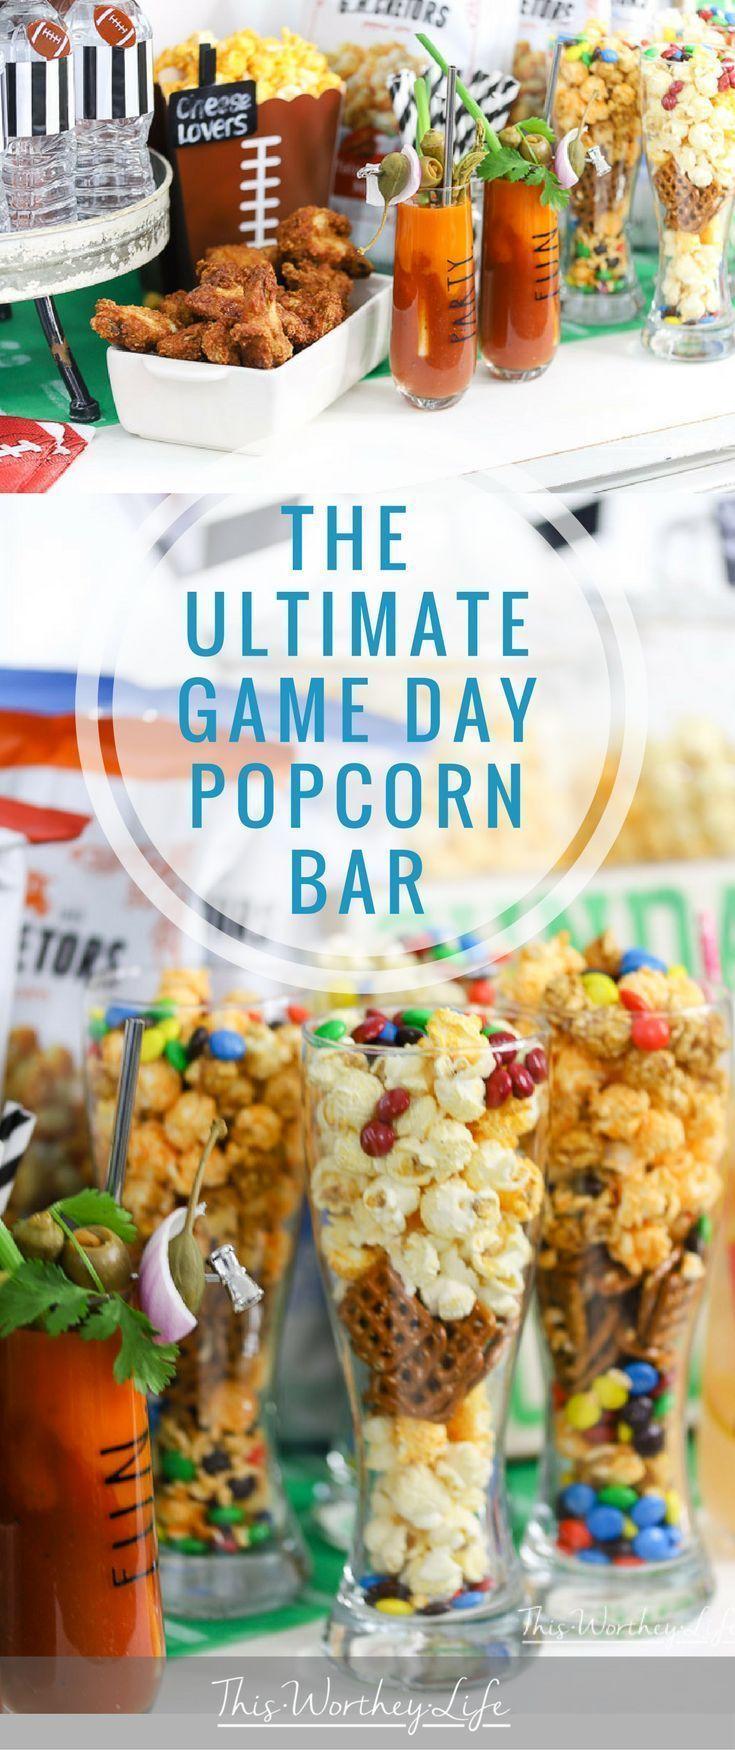 The Ultimate Popcorn Bar #footballfood